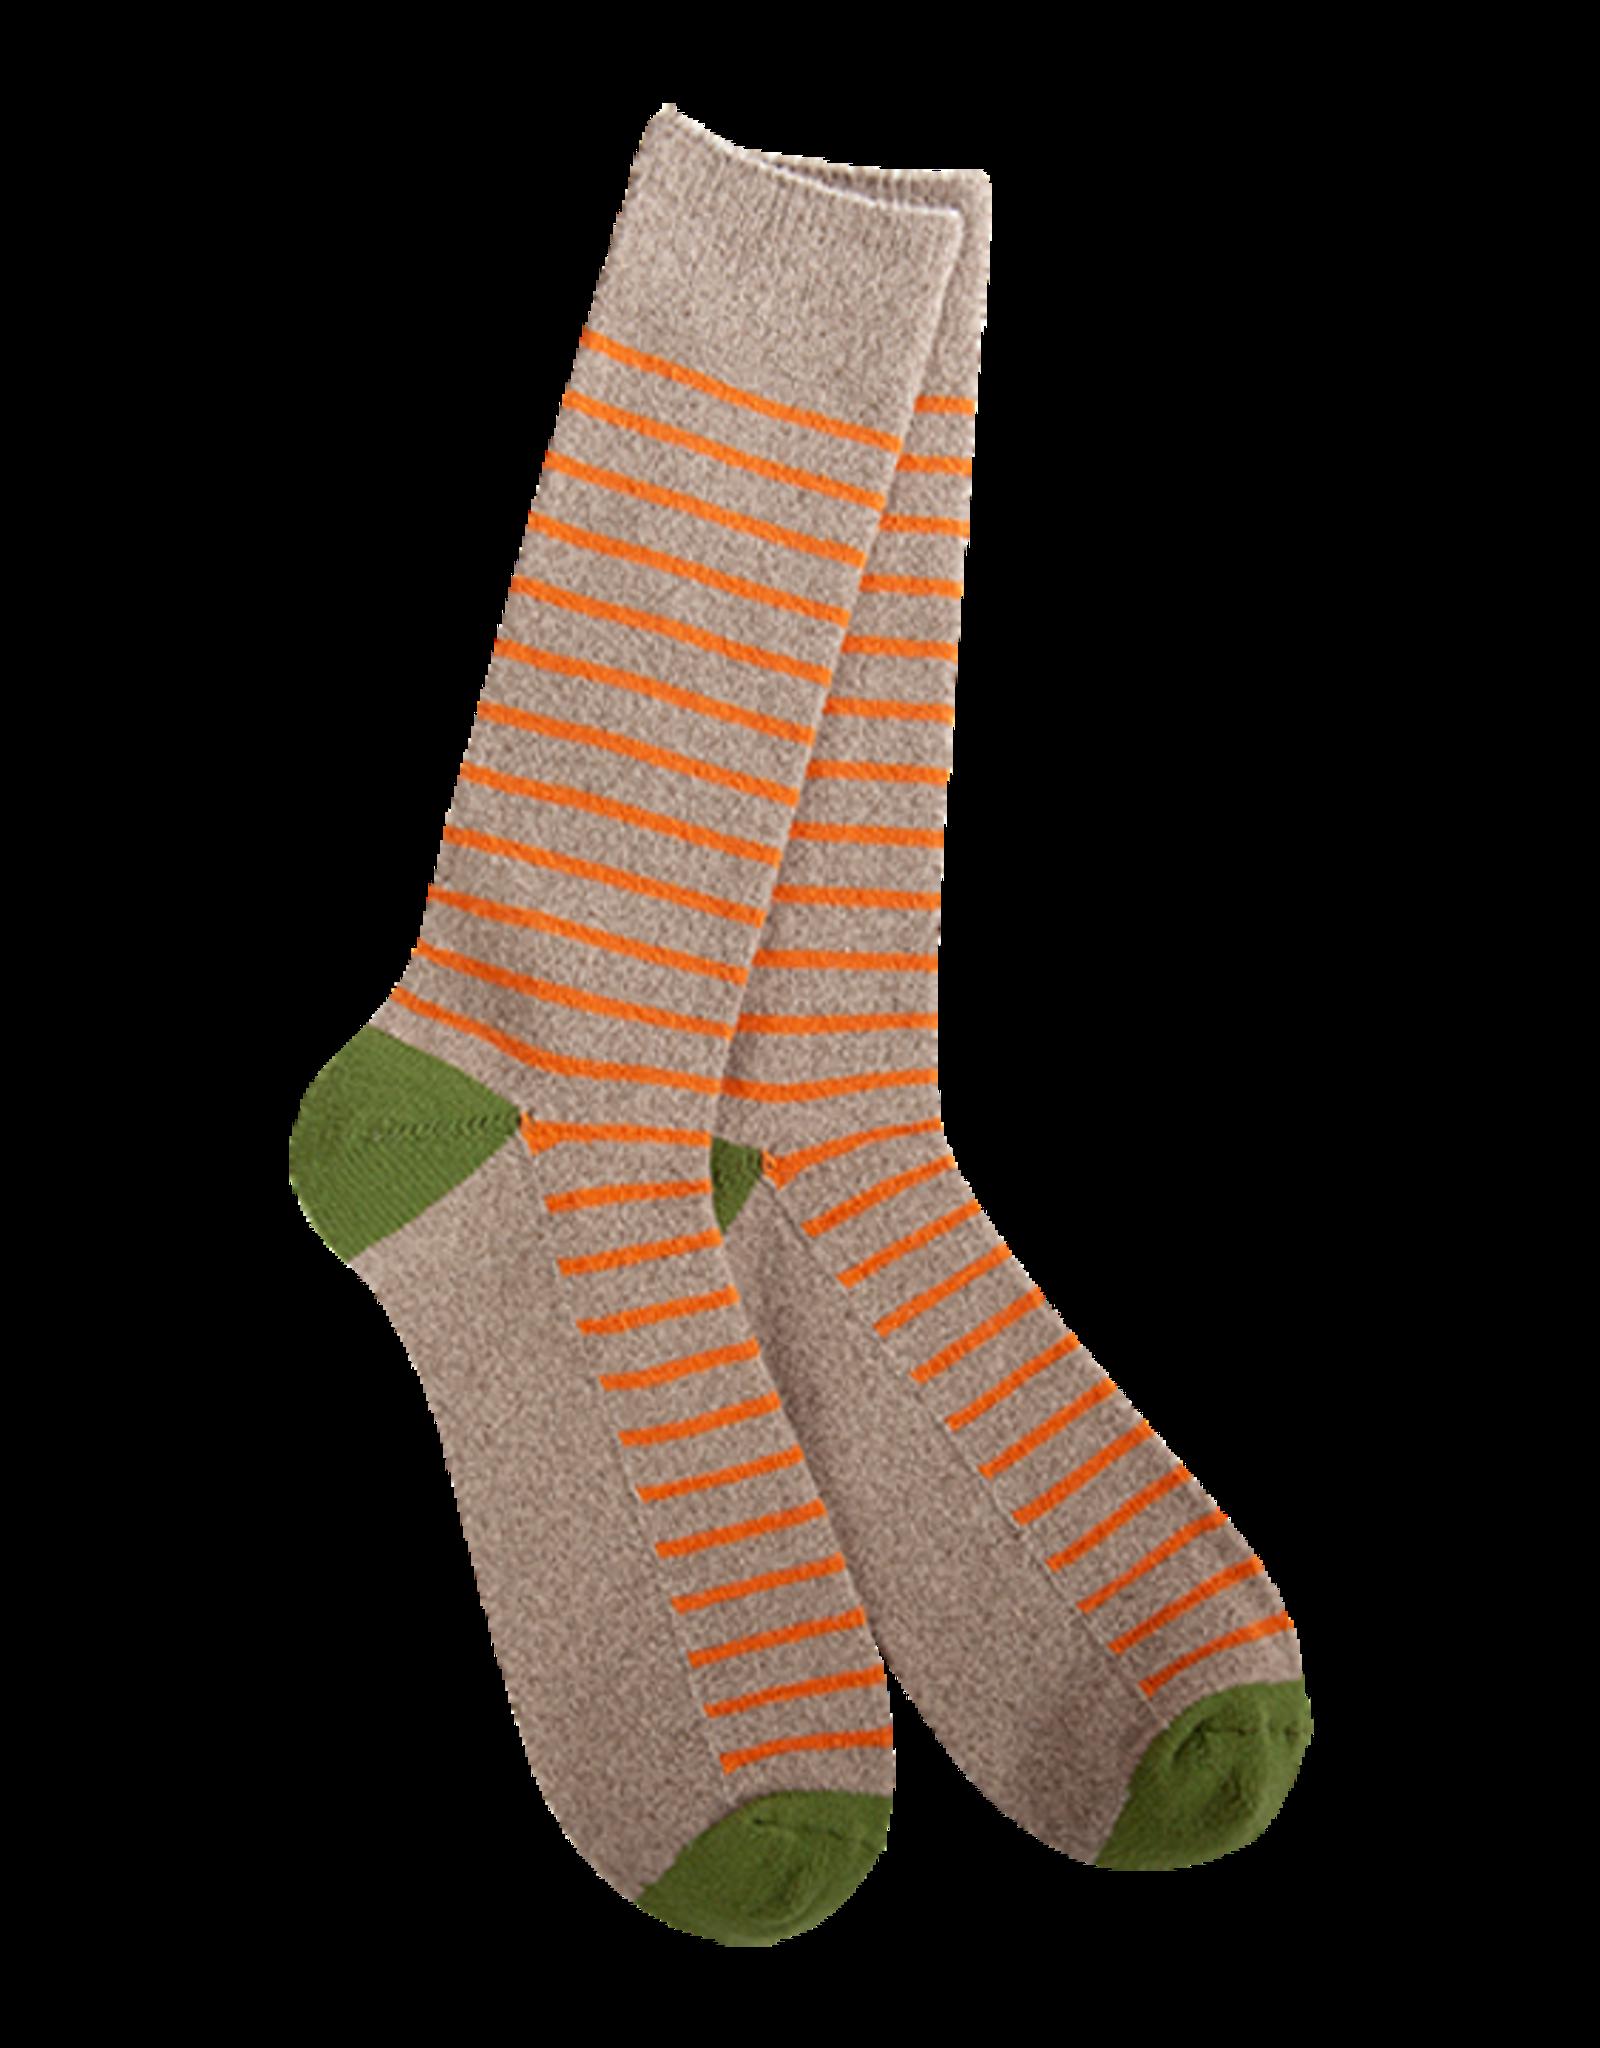 Crescent Sock Co. Crescent Sock Co. | Metro Crew